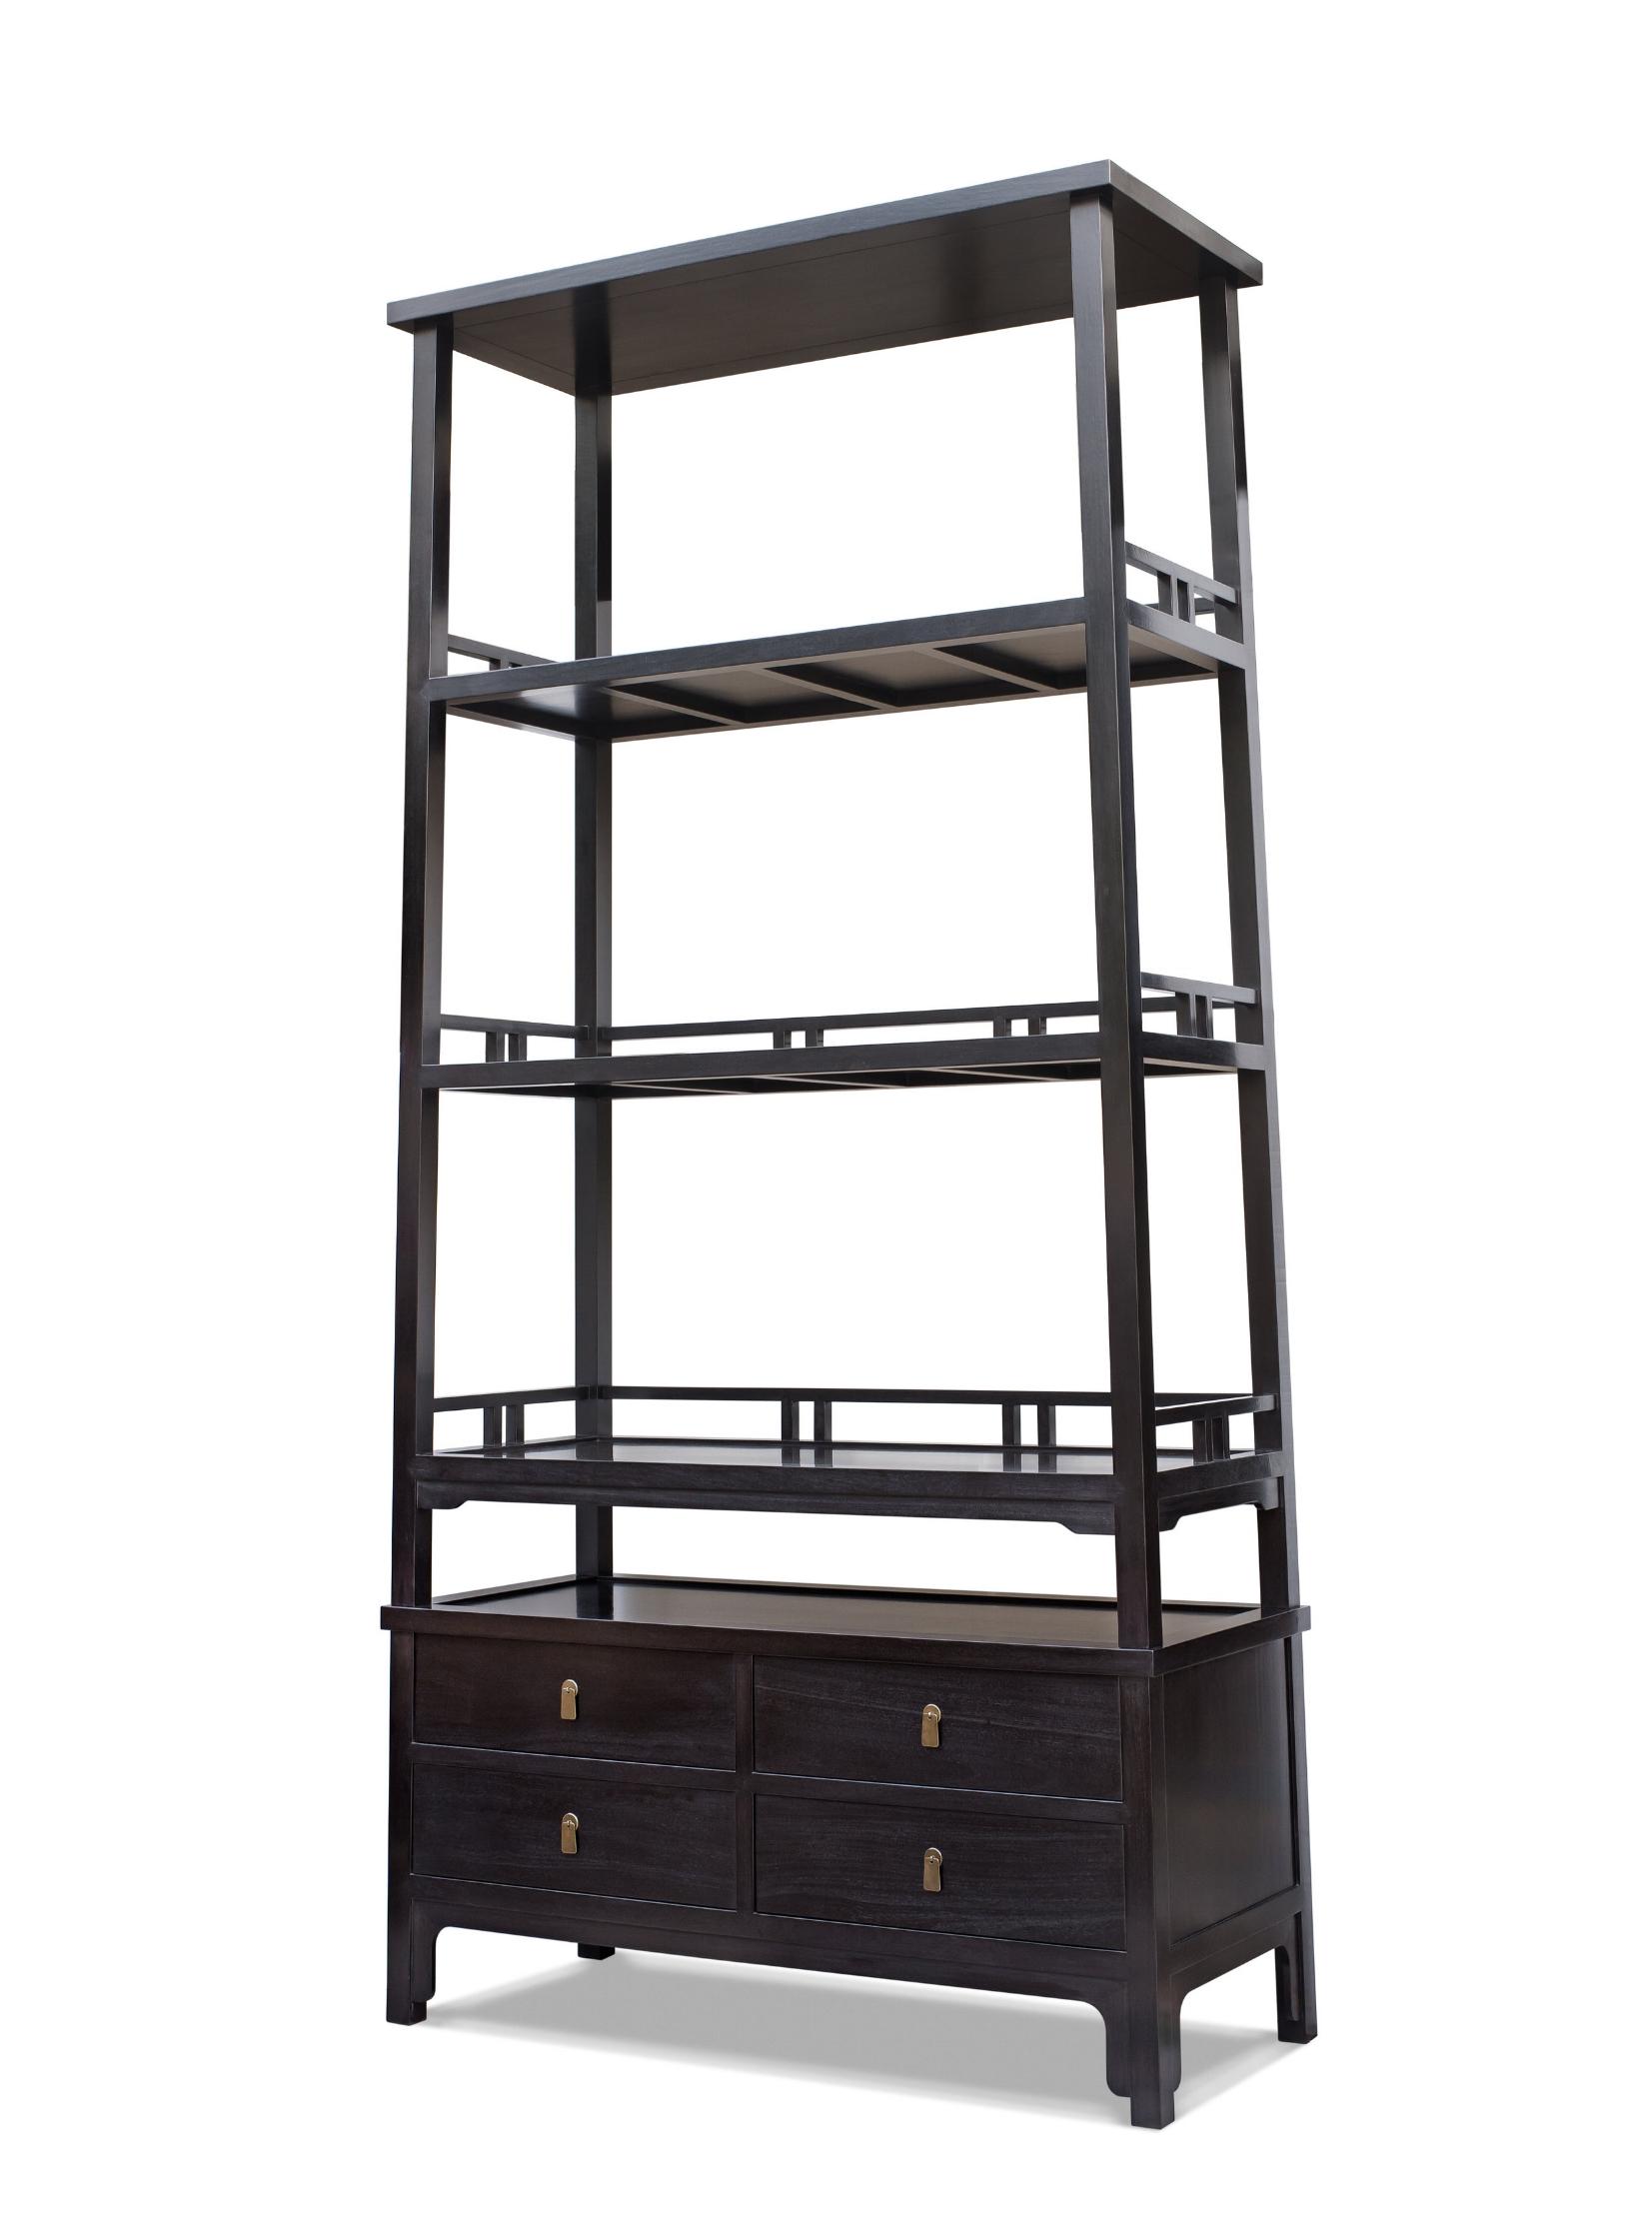 ....Bespoke Ming Style Chinese furniture : Bookshelf..特别定制明式中式家具: 书架....